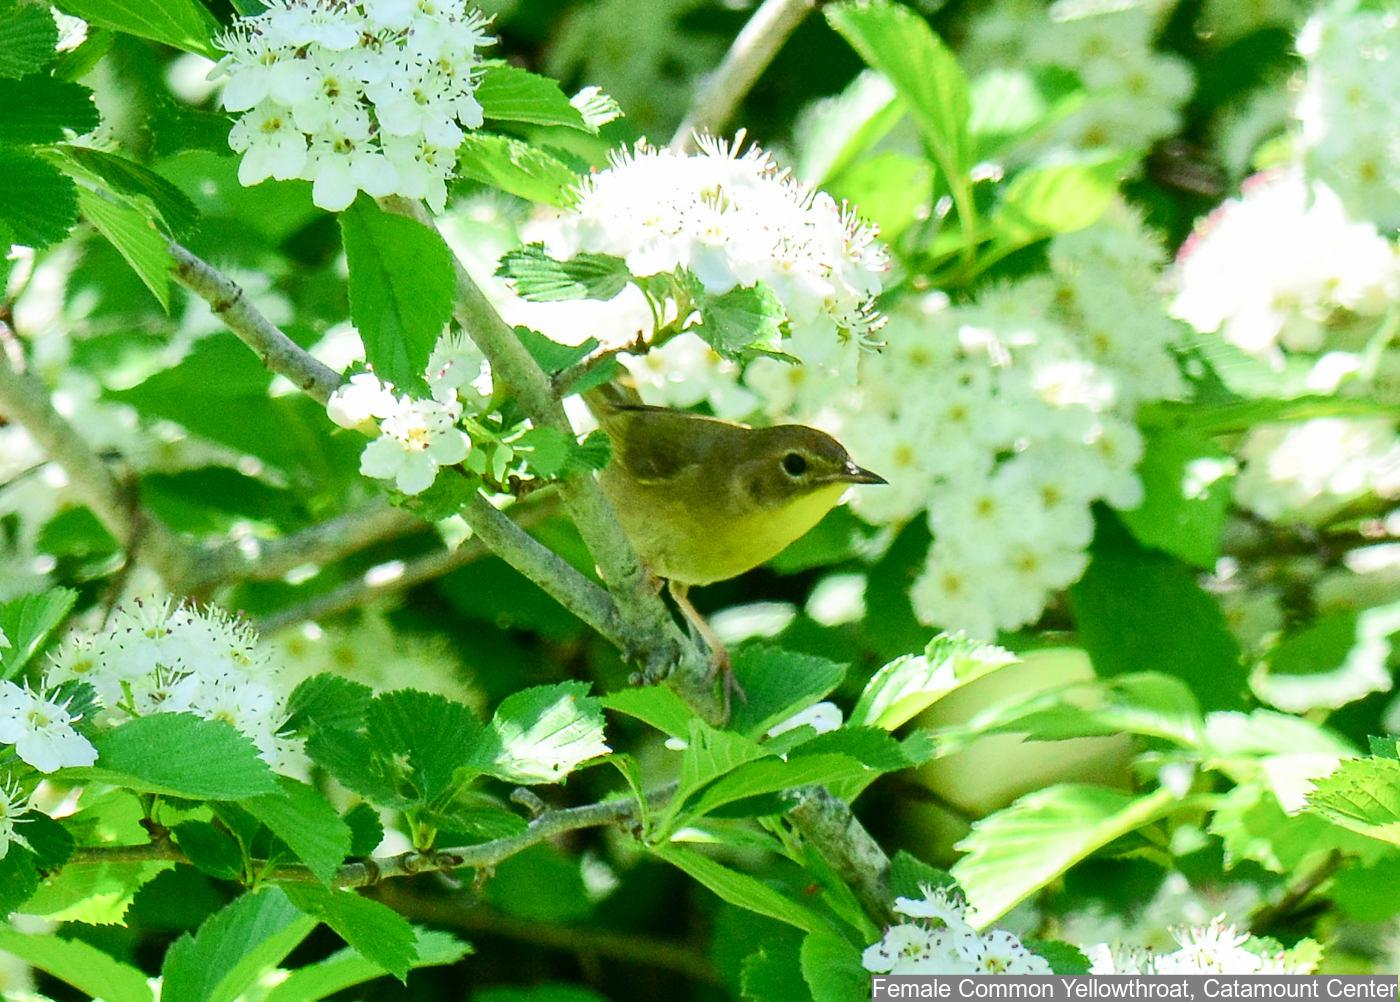 Common Yellowthroat Photo: Marc Faucher